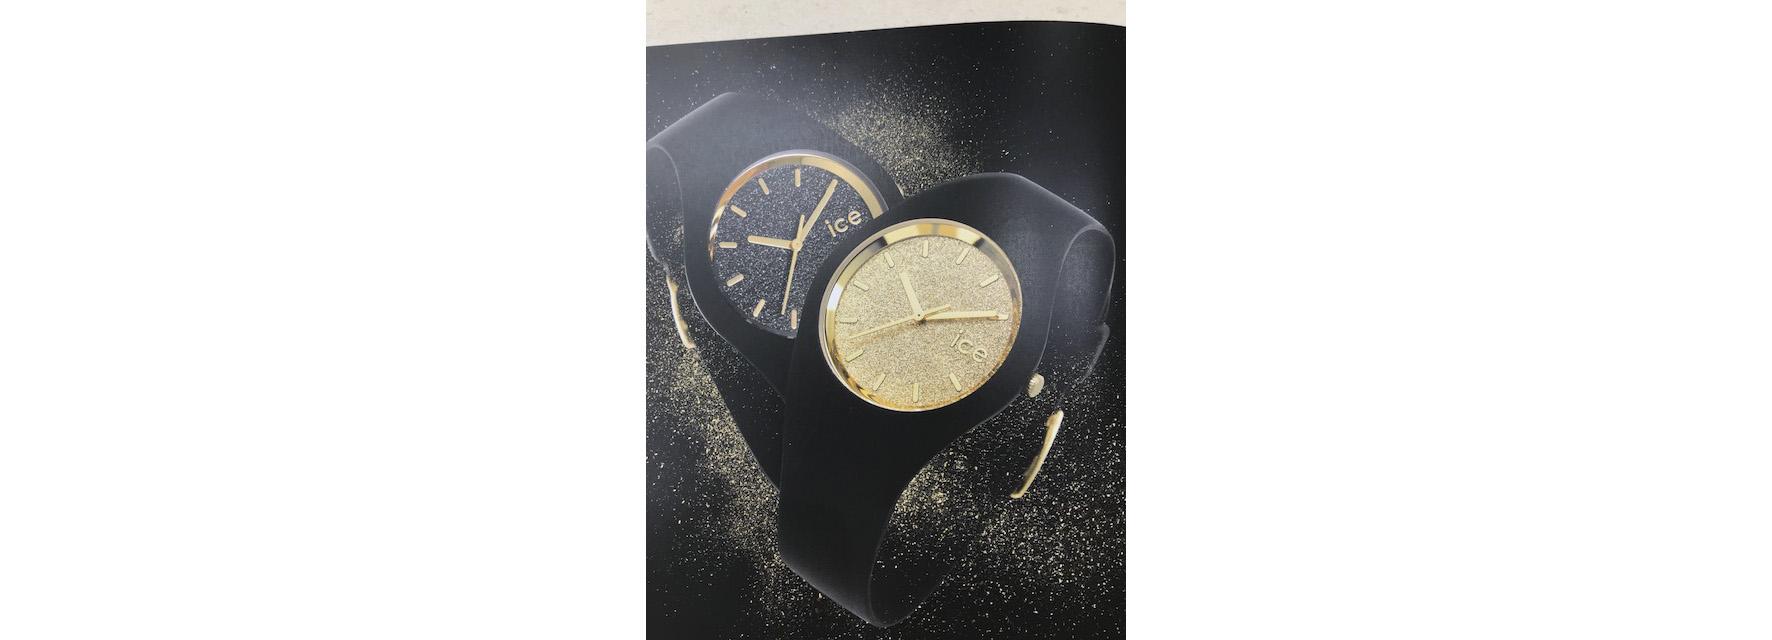 montre noire femme ice watch